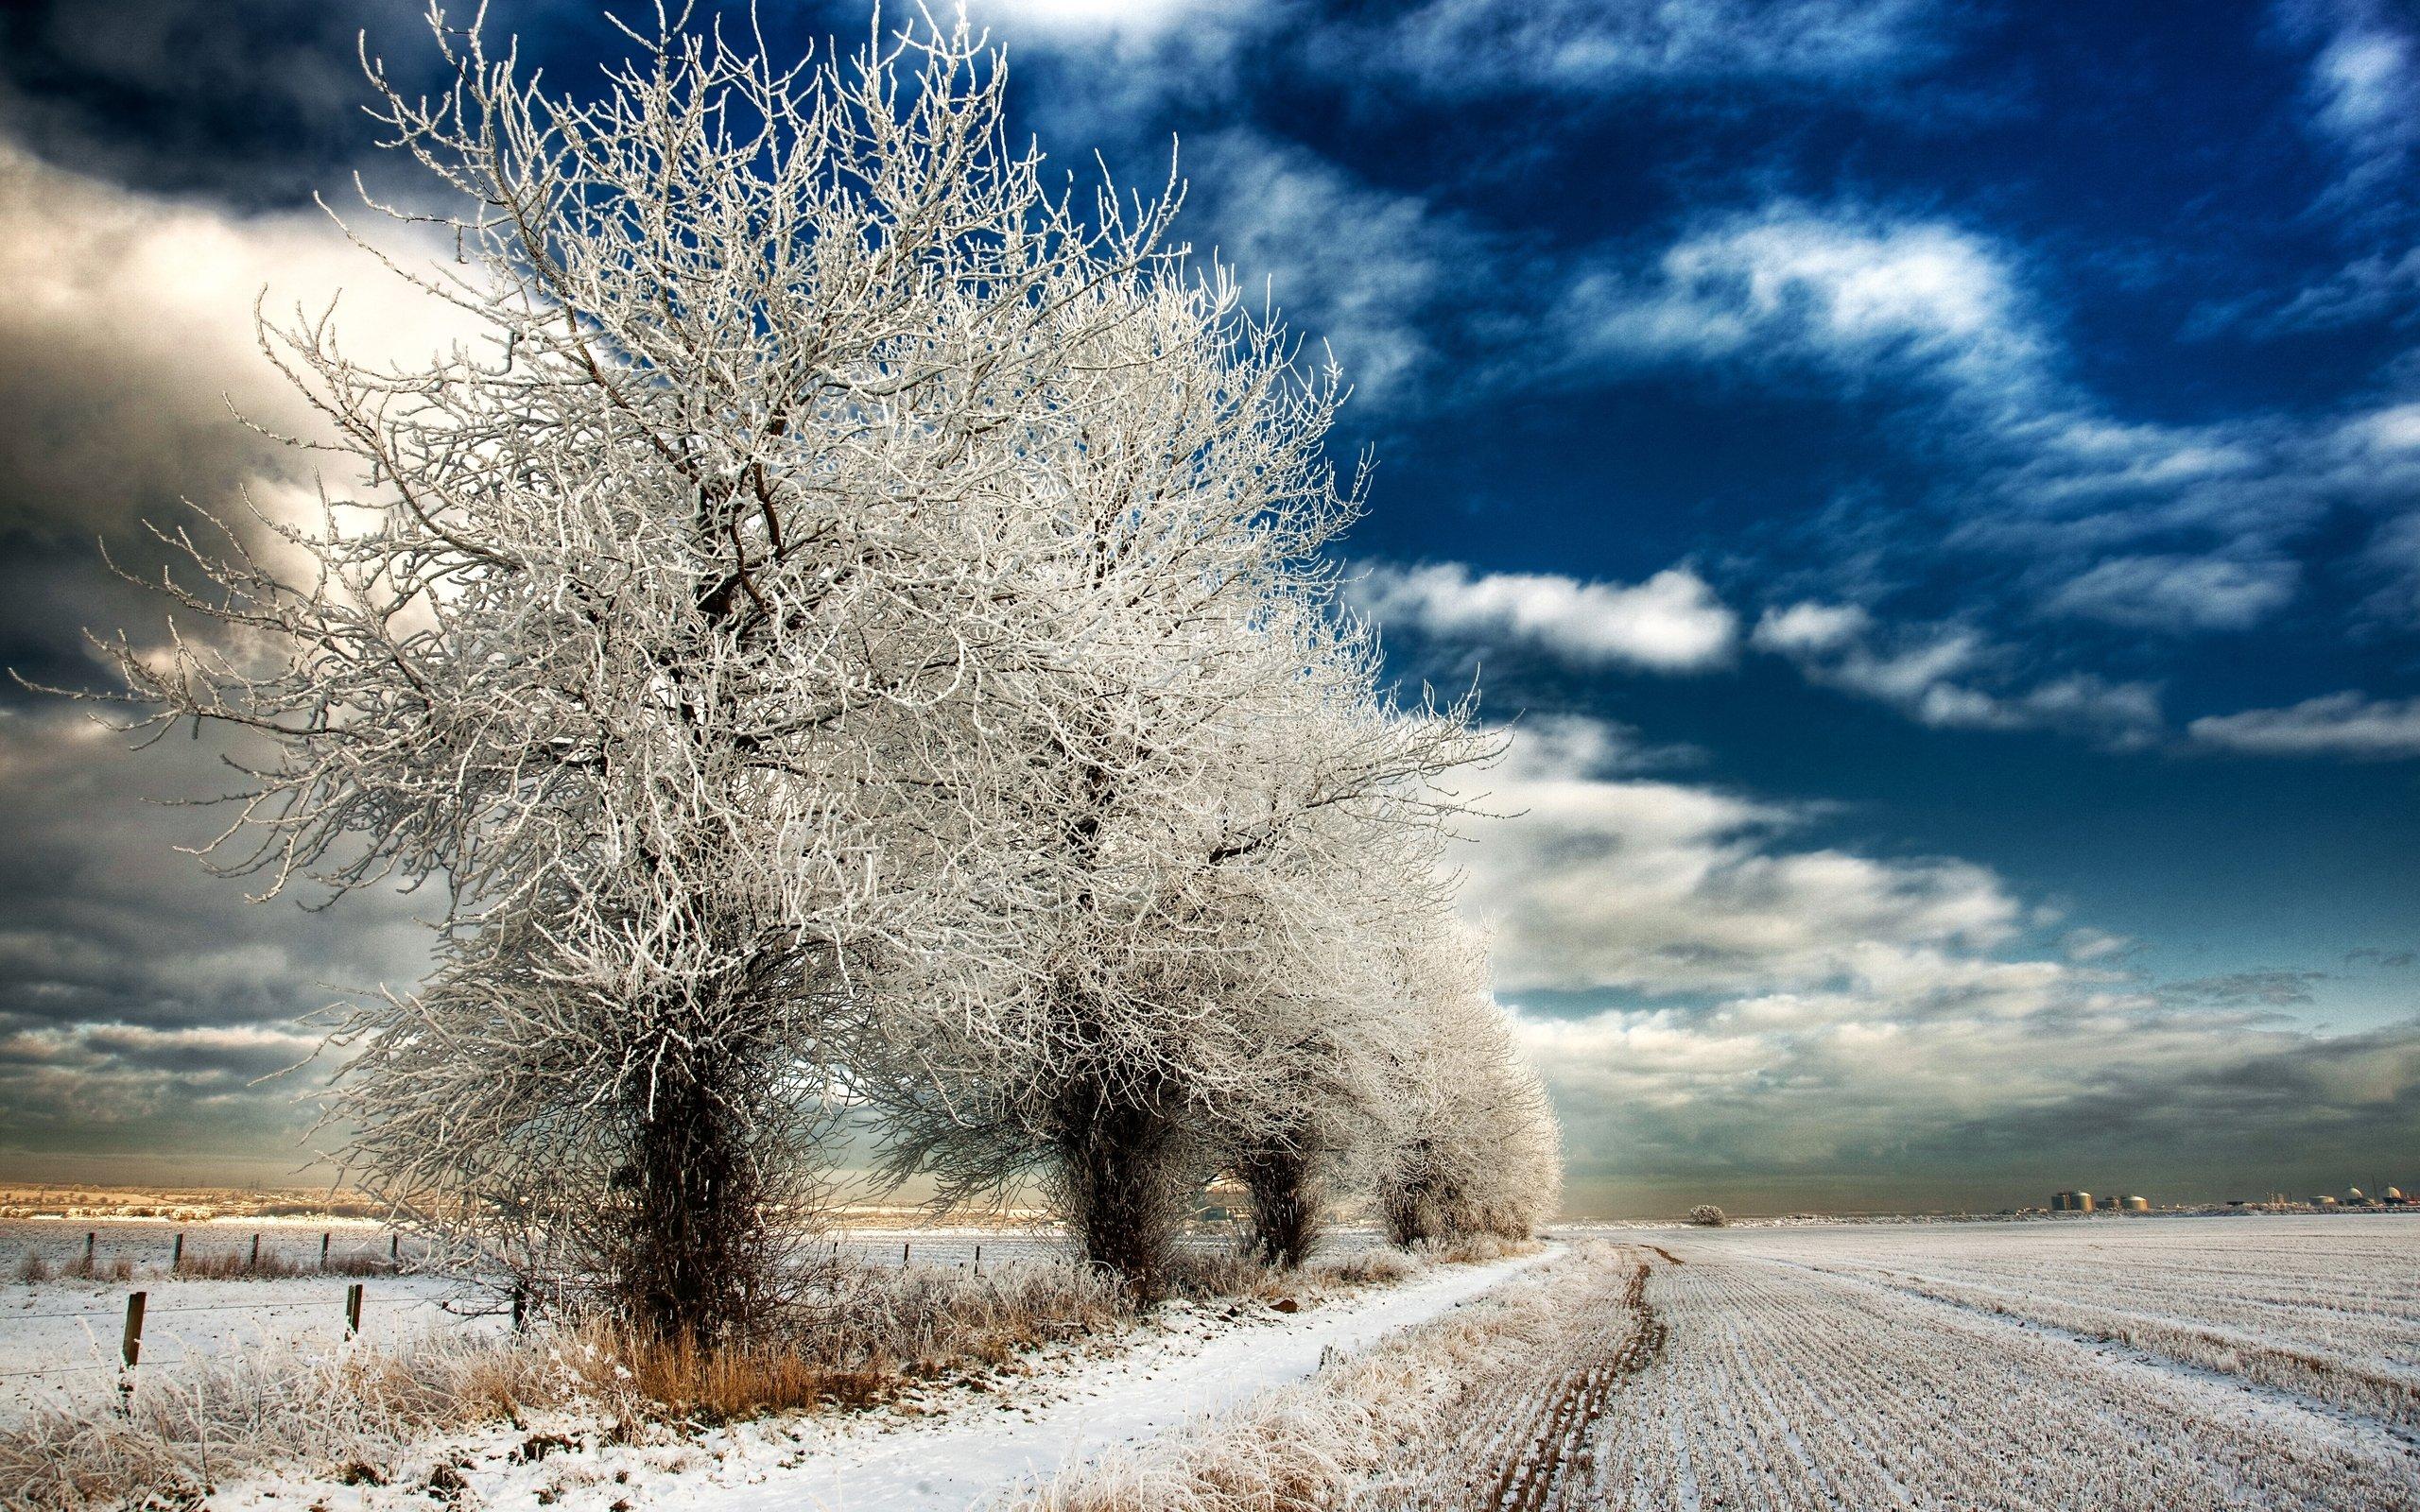 Winter landscape wallpaper for desktop wallpapersafari - Wallpaper hd nature winter ...